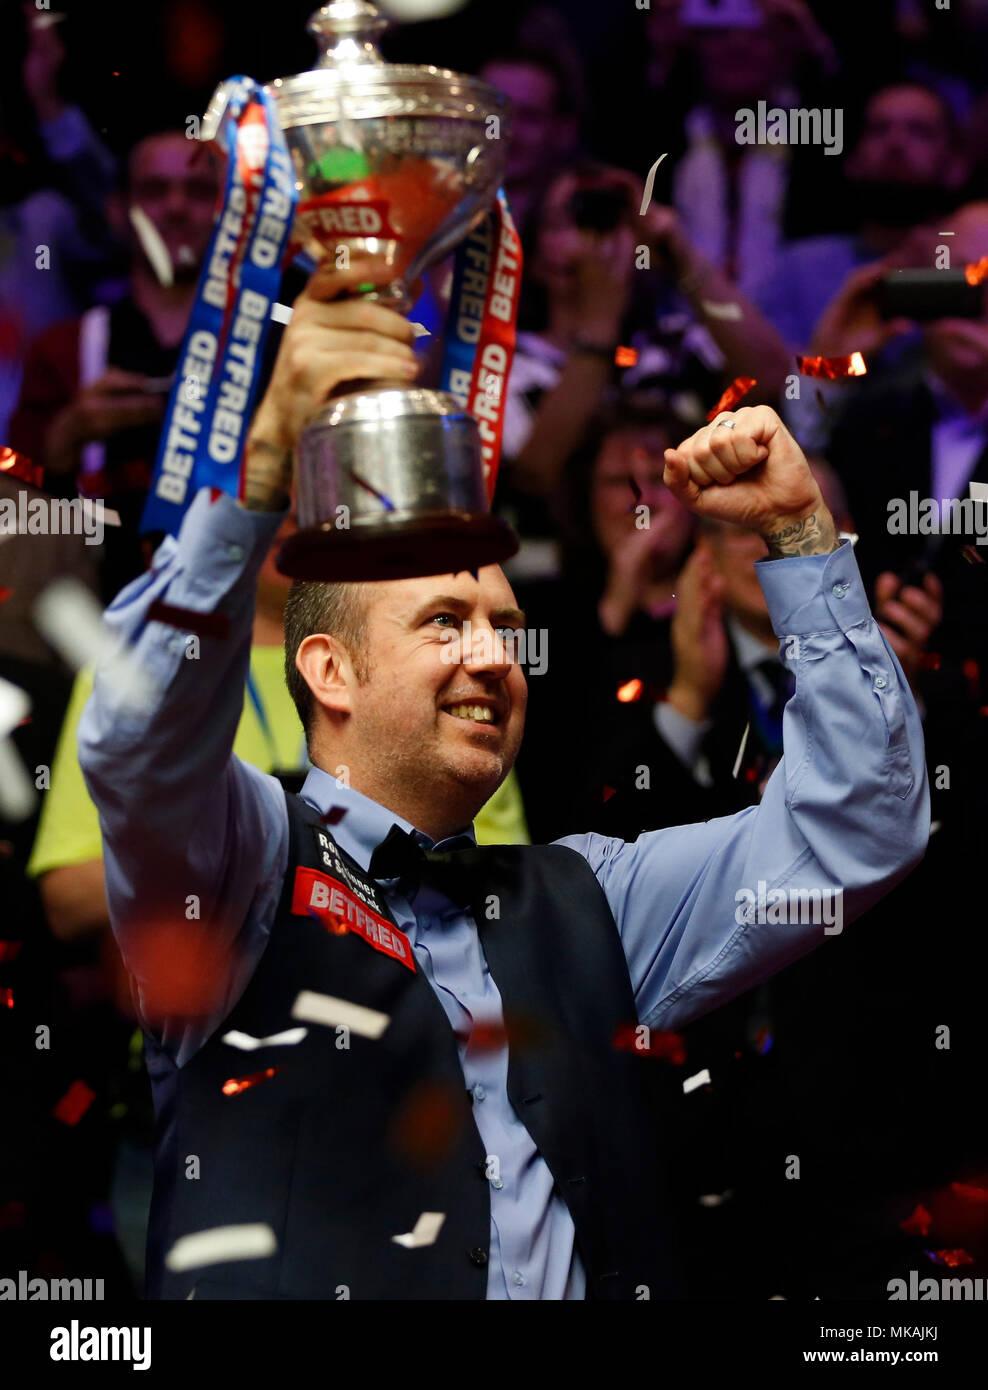 World Snooker Championship Stock Photos & World Snooker ...